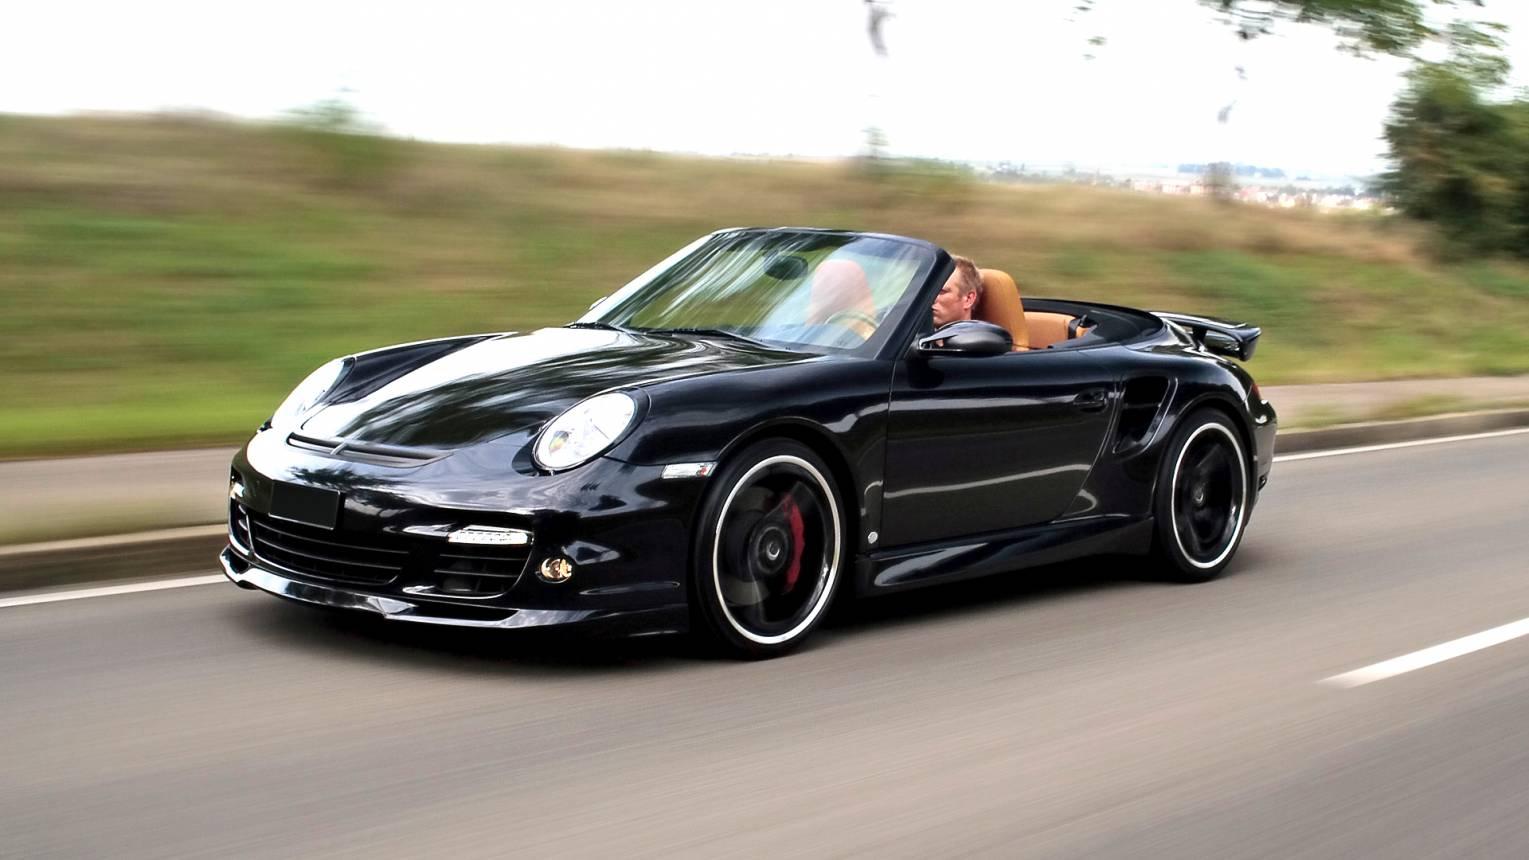 Porsche 911-es klasszikus sportautó bérlése